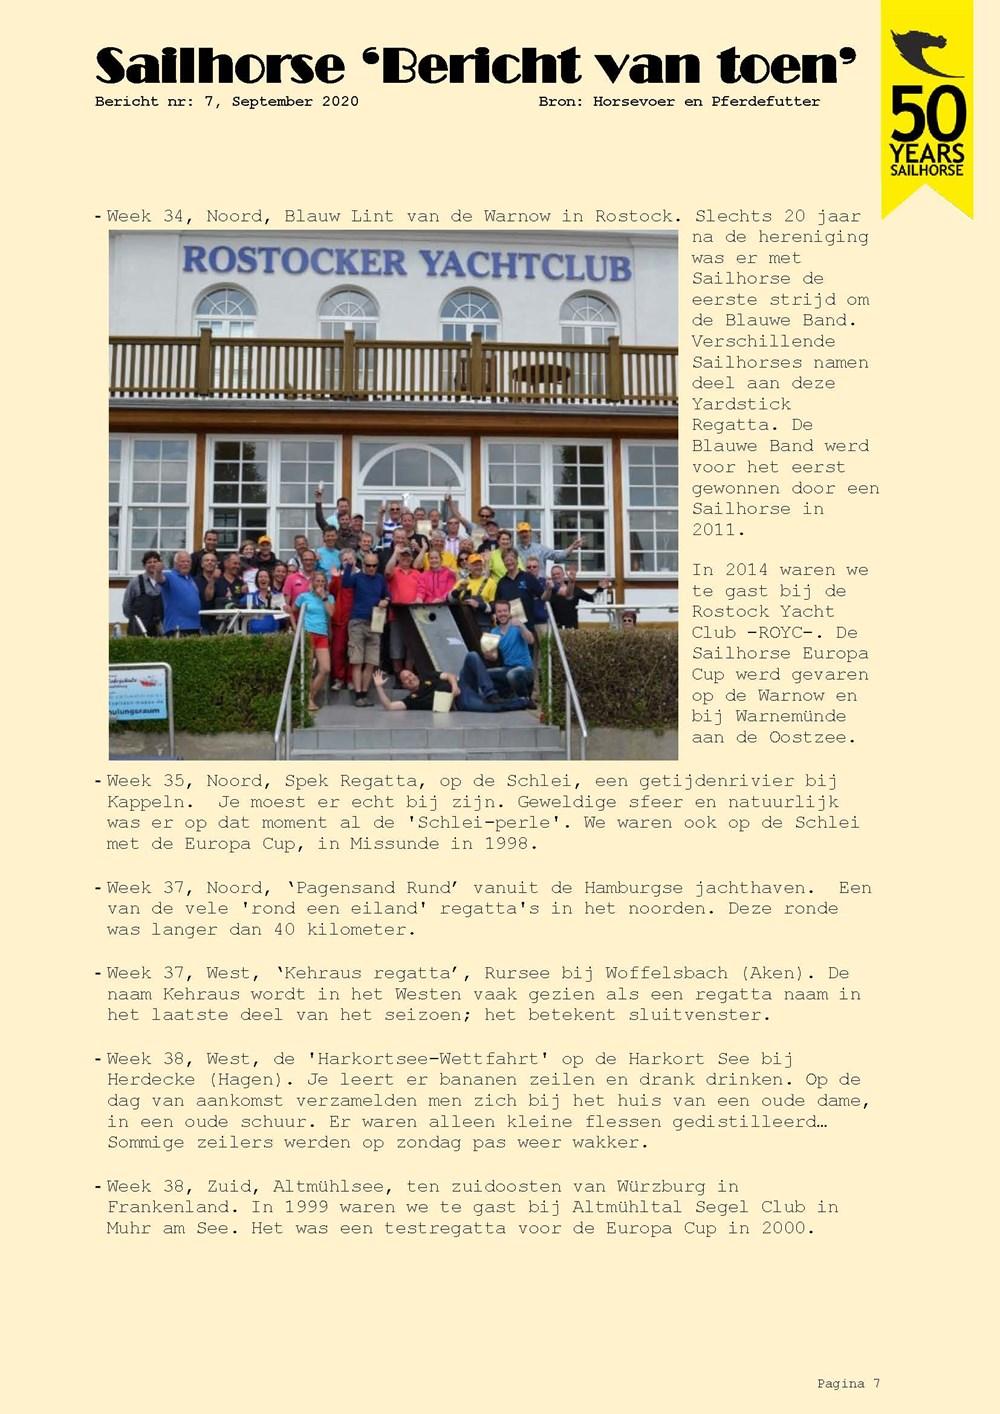 BvT7_Page_7.jpg